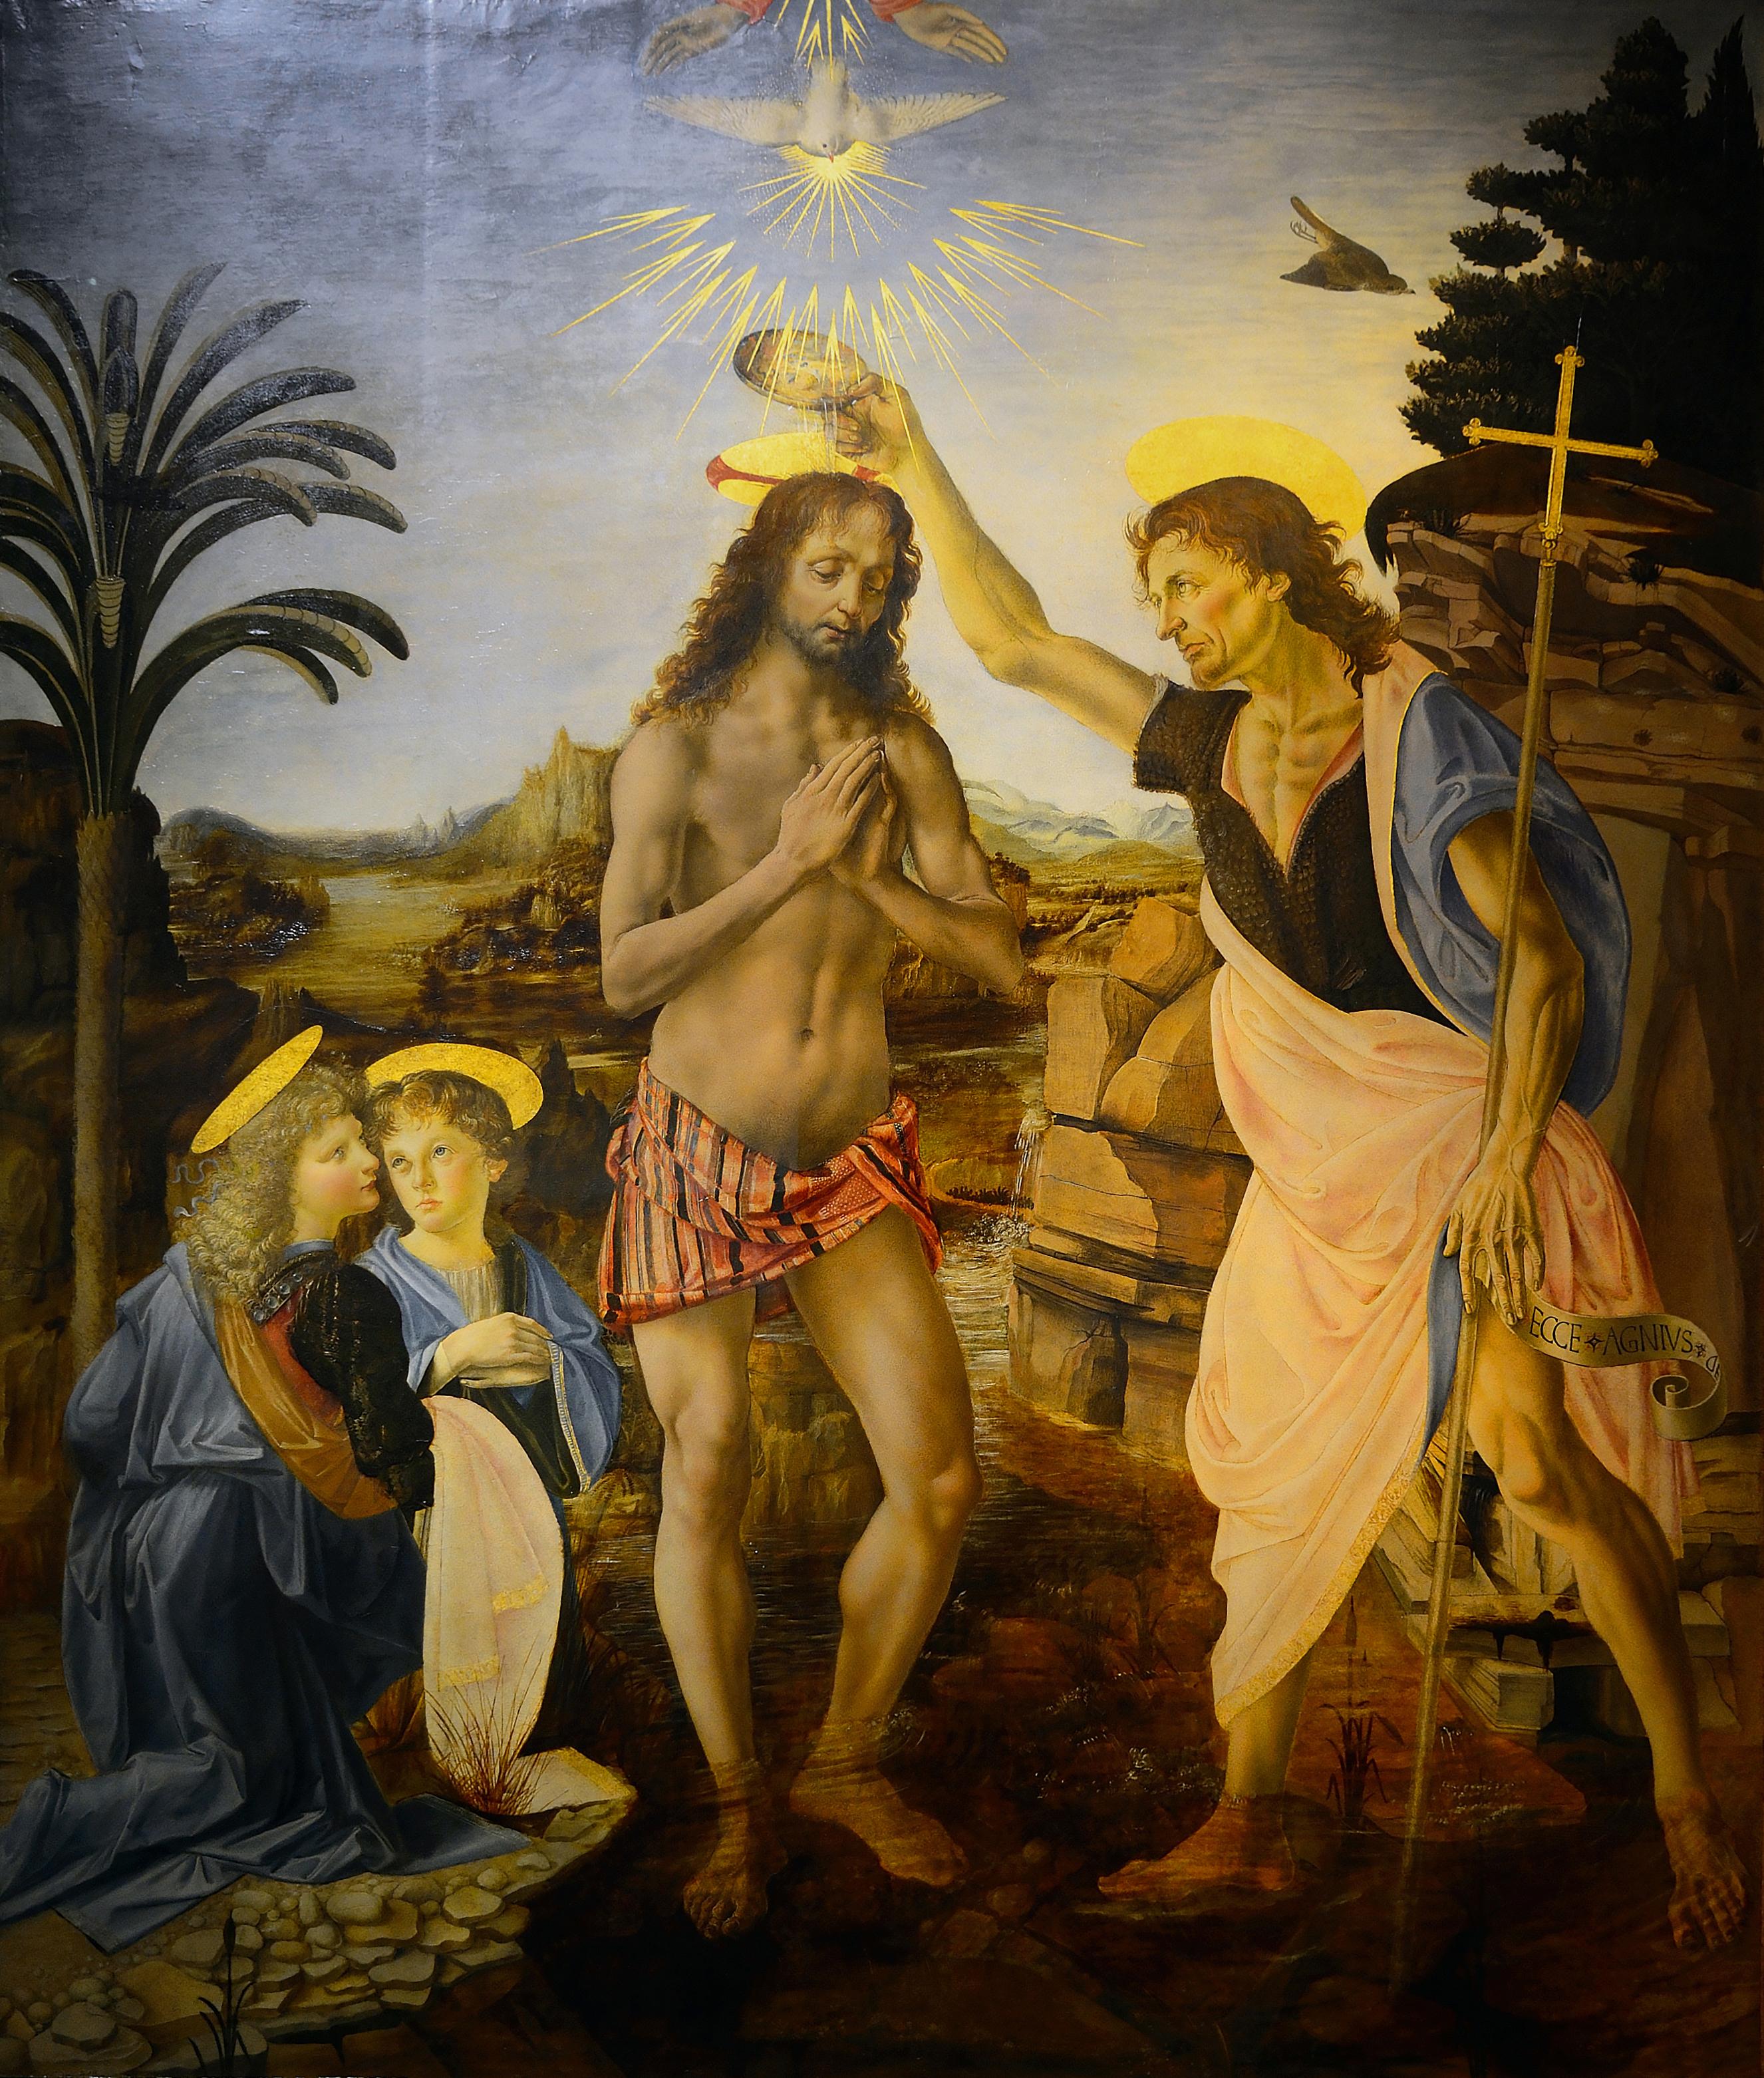 Die Taufe Christi, Öl/Holz, um 1470-75, Florenz, Galleria degli Uffizi